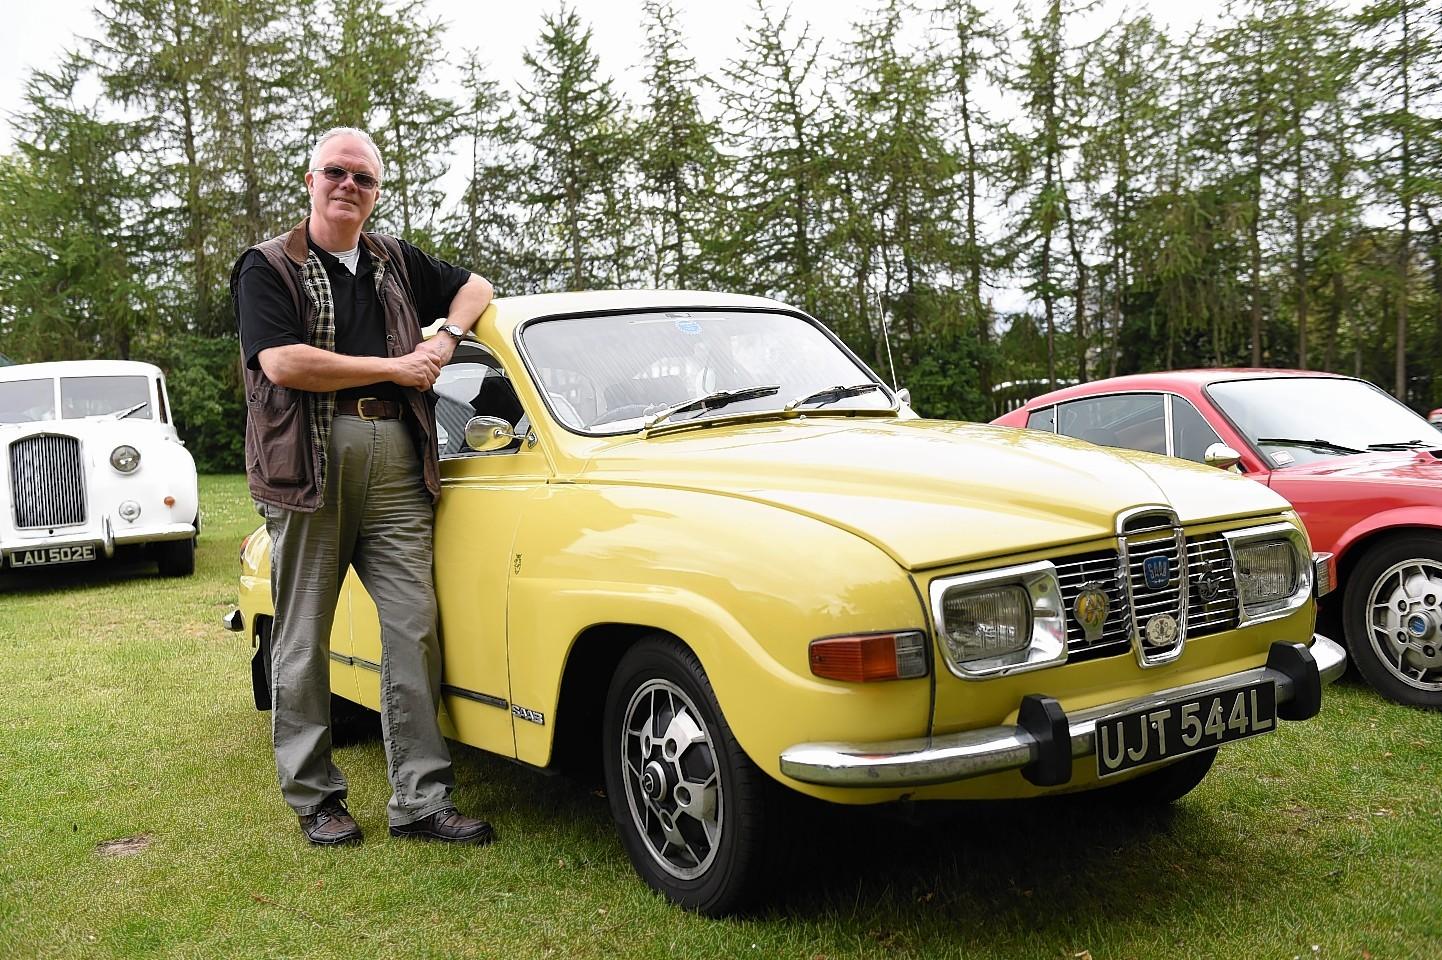 Derek Darnell owner of the headline car a Saab 96